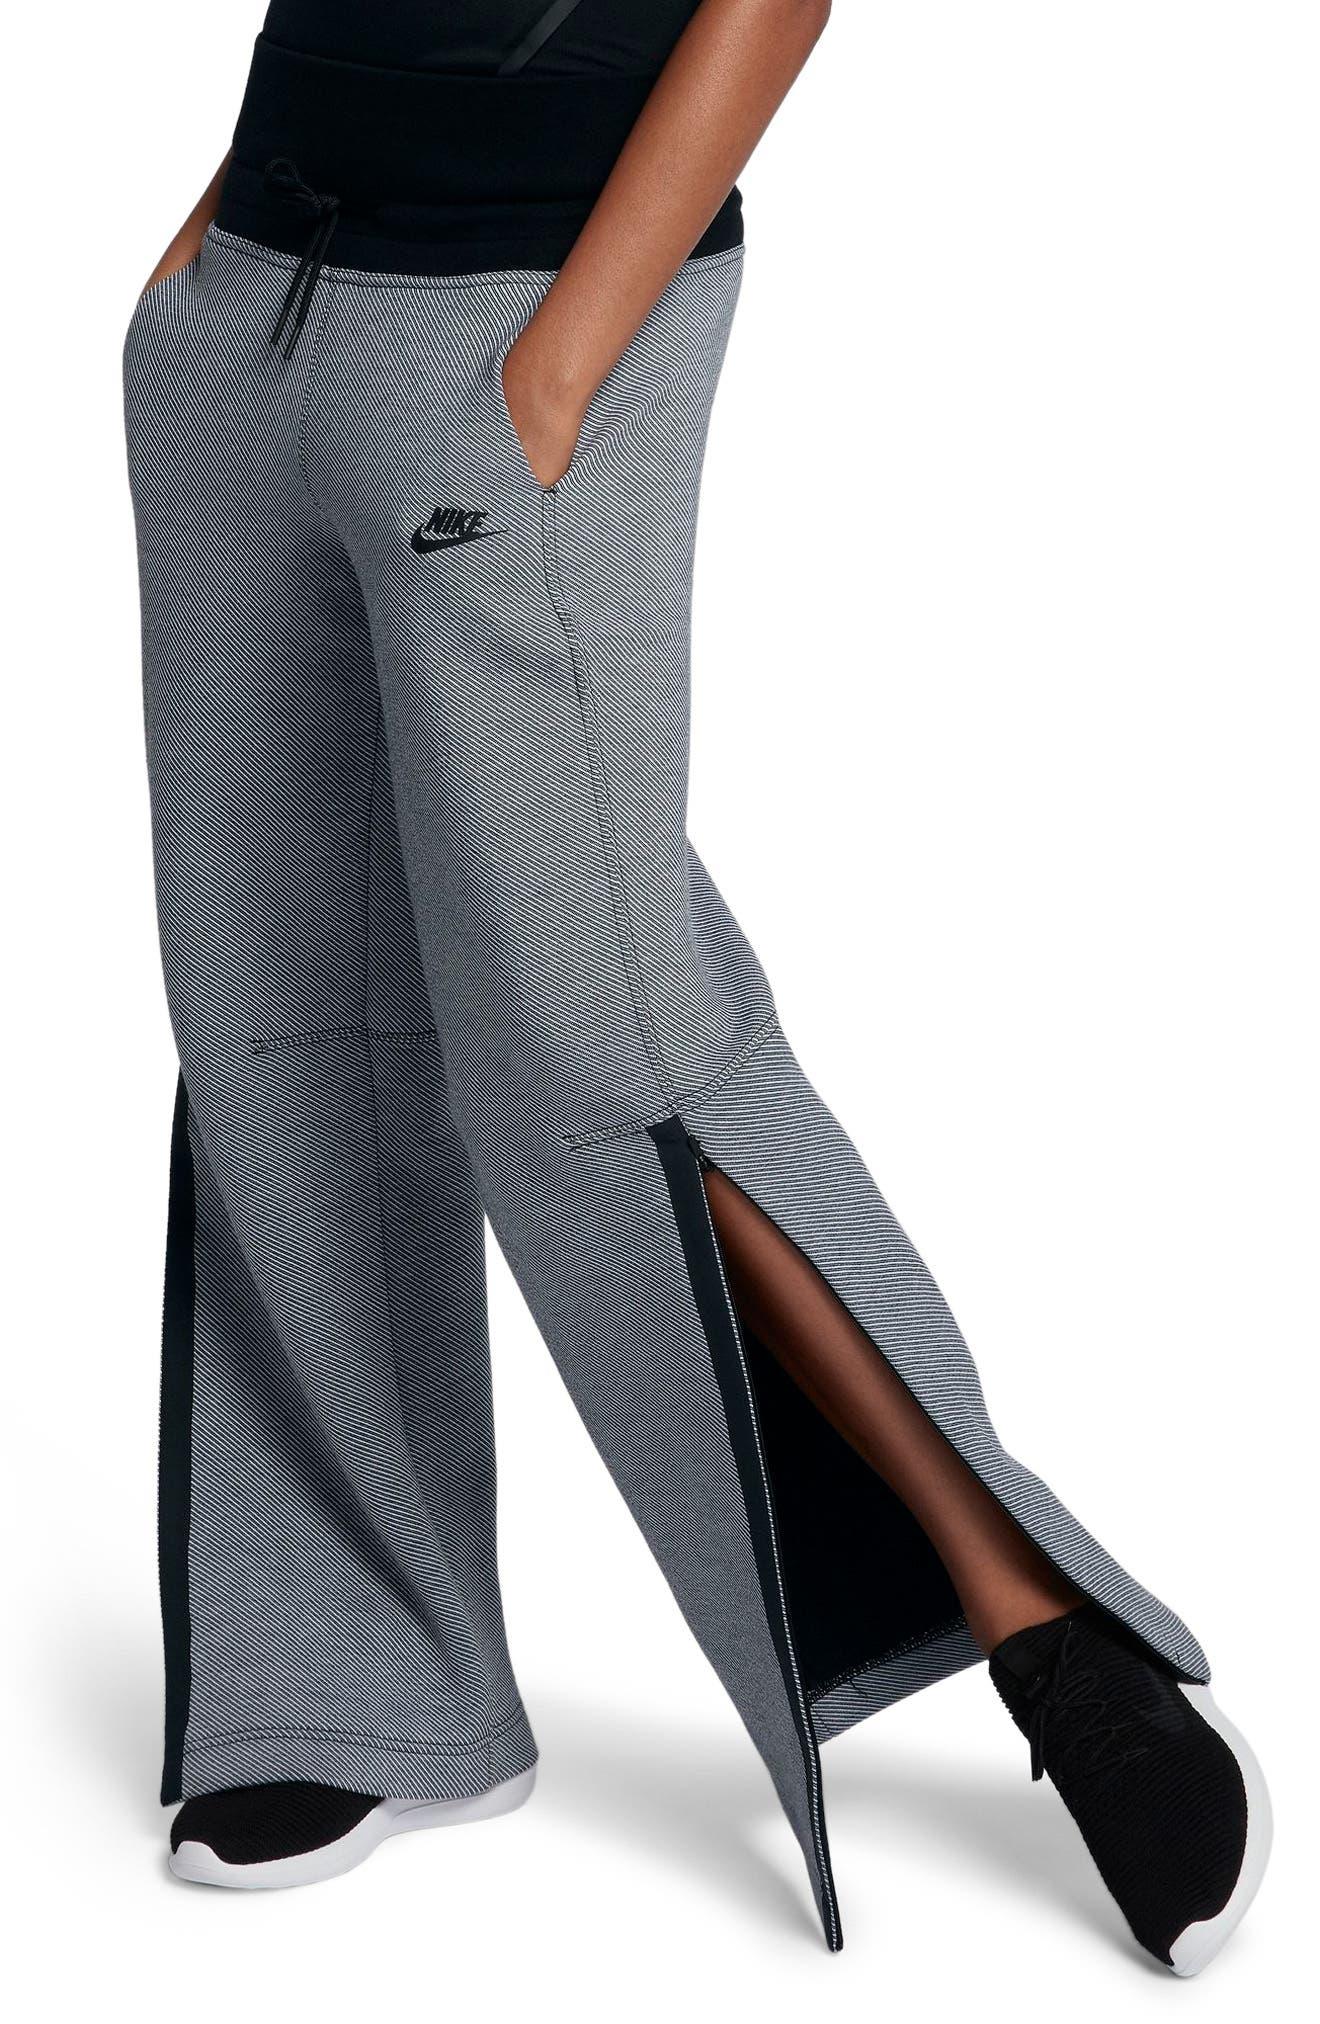 Drawstring Technical Pants,                         Main,                         color, Black/ Black